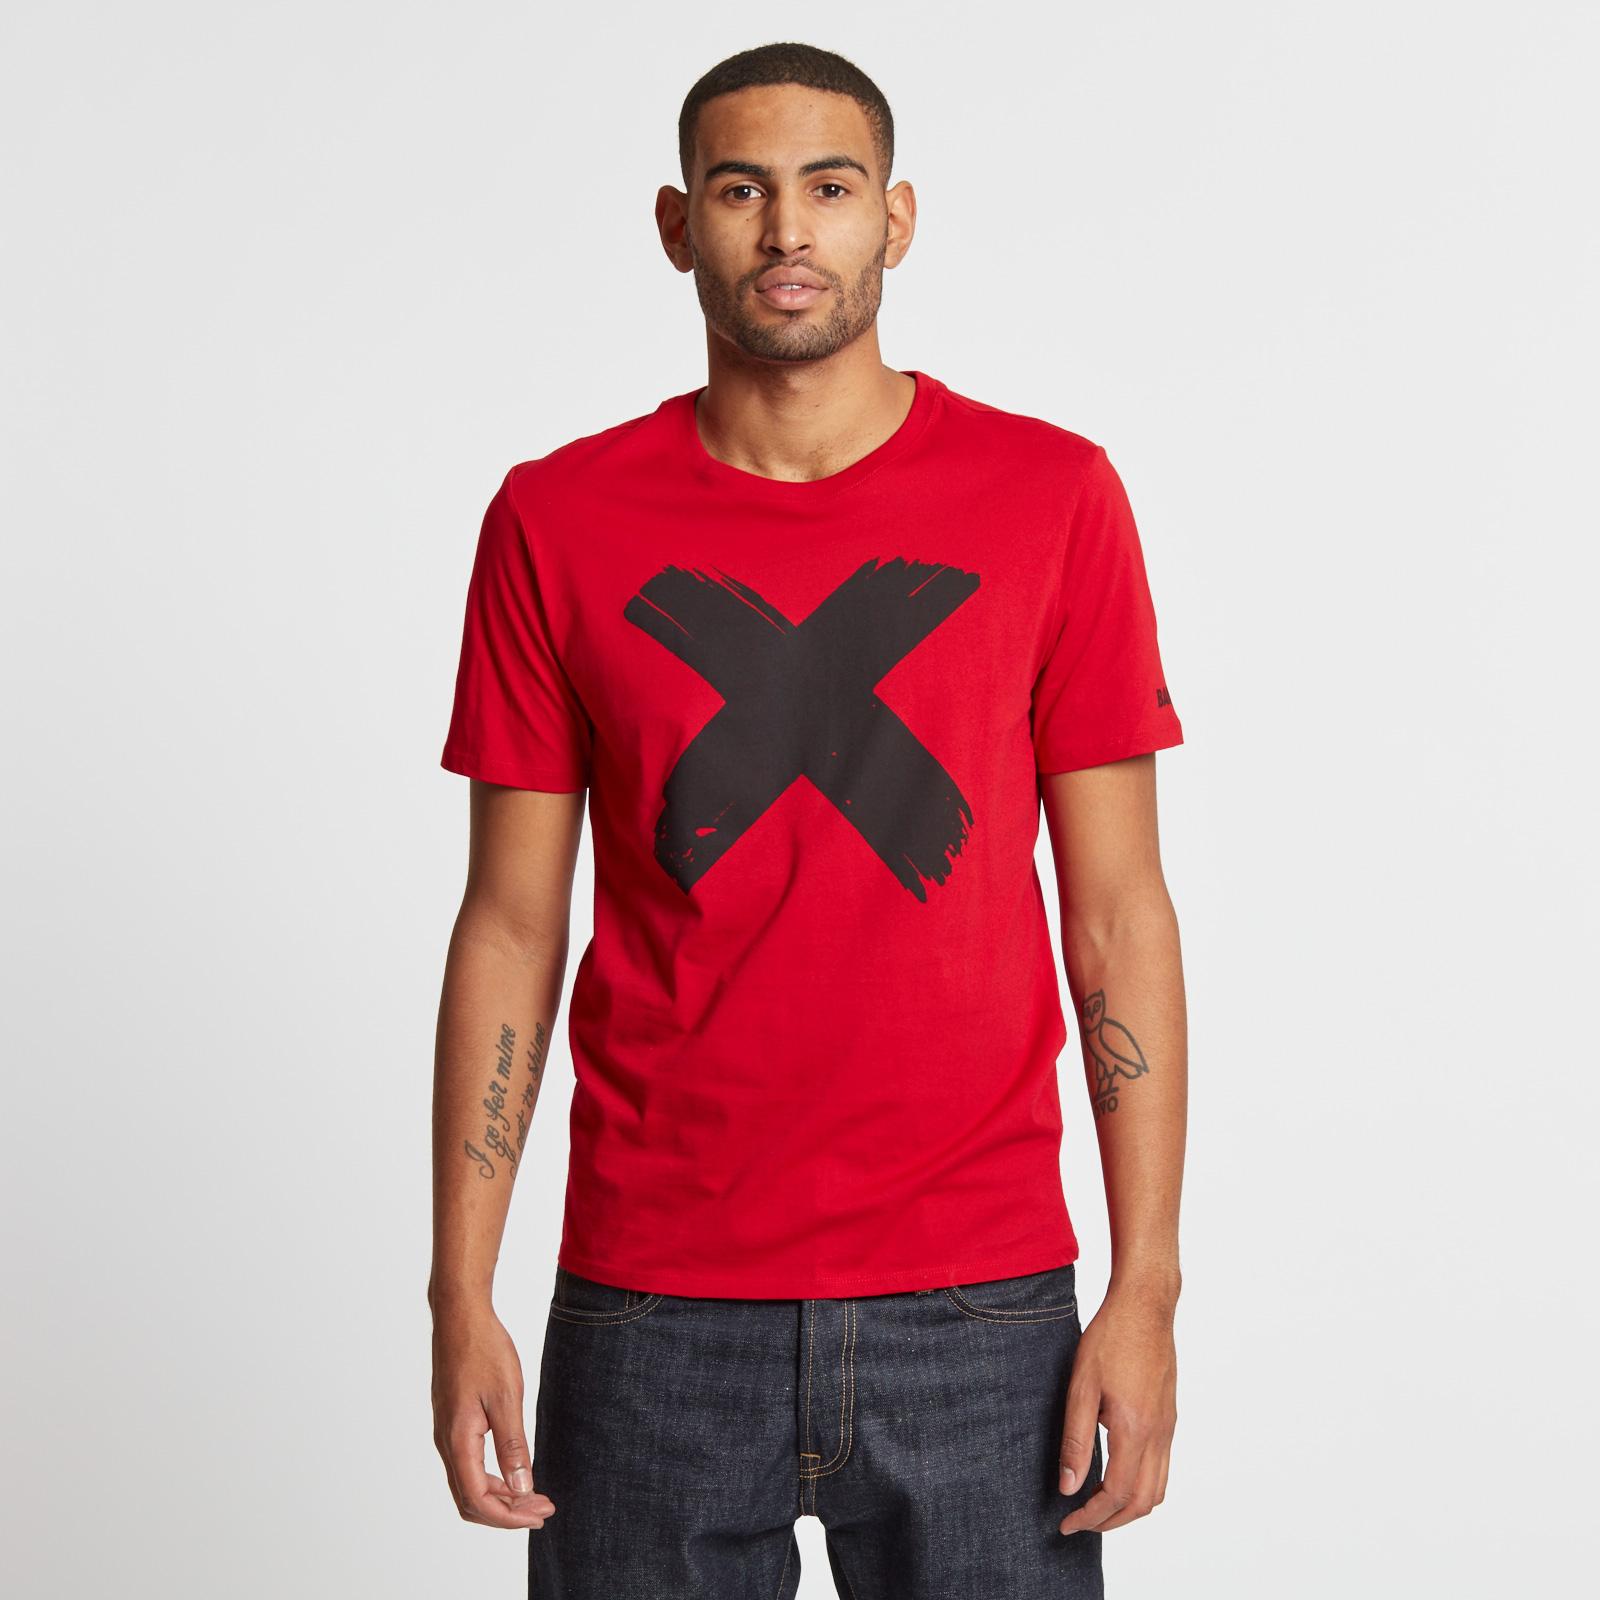 Jordan Brand AJ 1 Banned Logo Tee - 842254-687